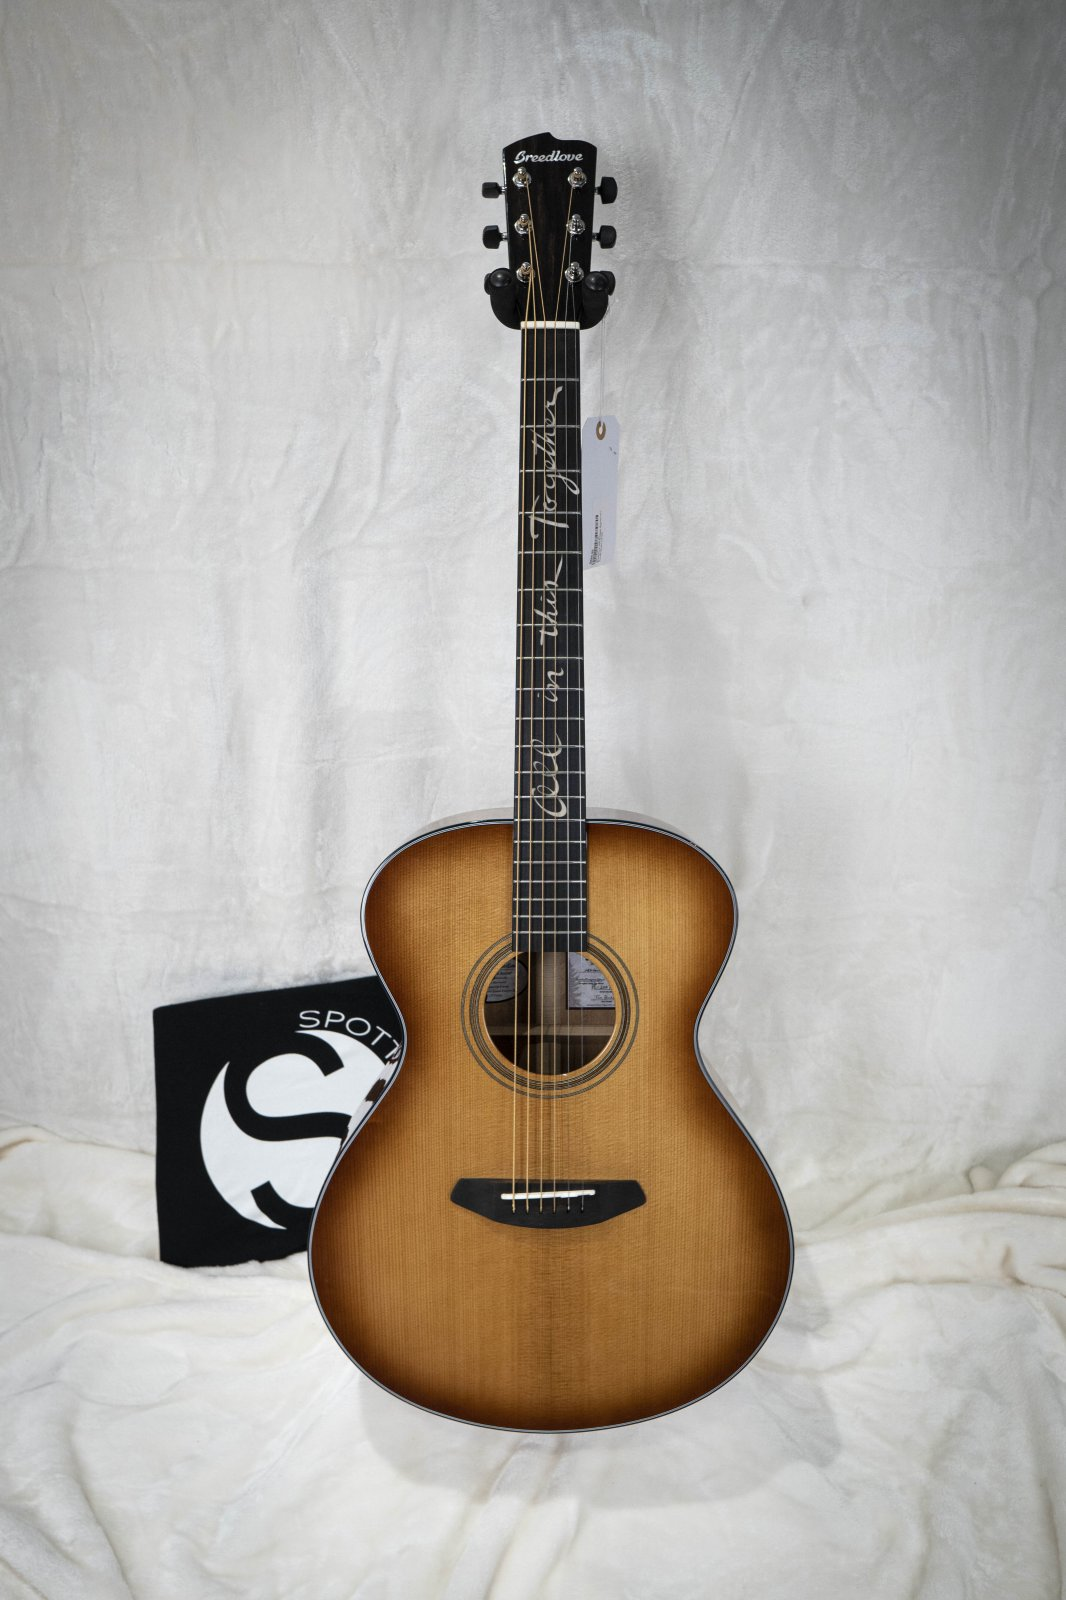 (Pre-Order) Breedlove Jeff Bridges Signature Concert Copper E Acoustic Electric Guitar